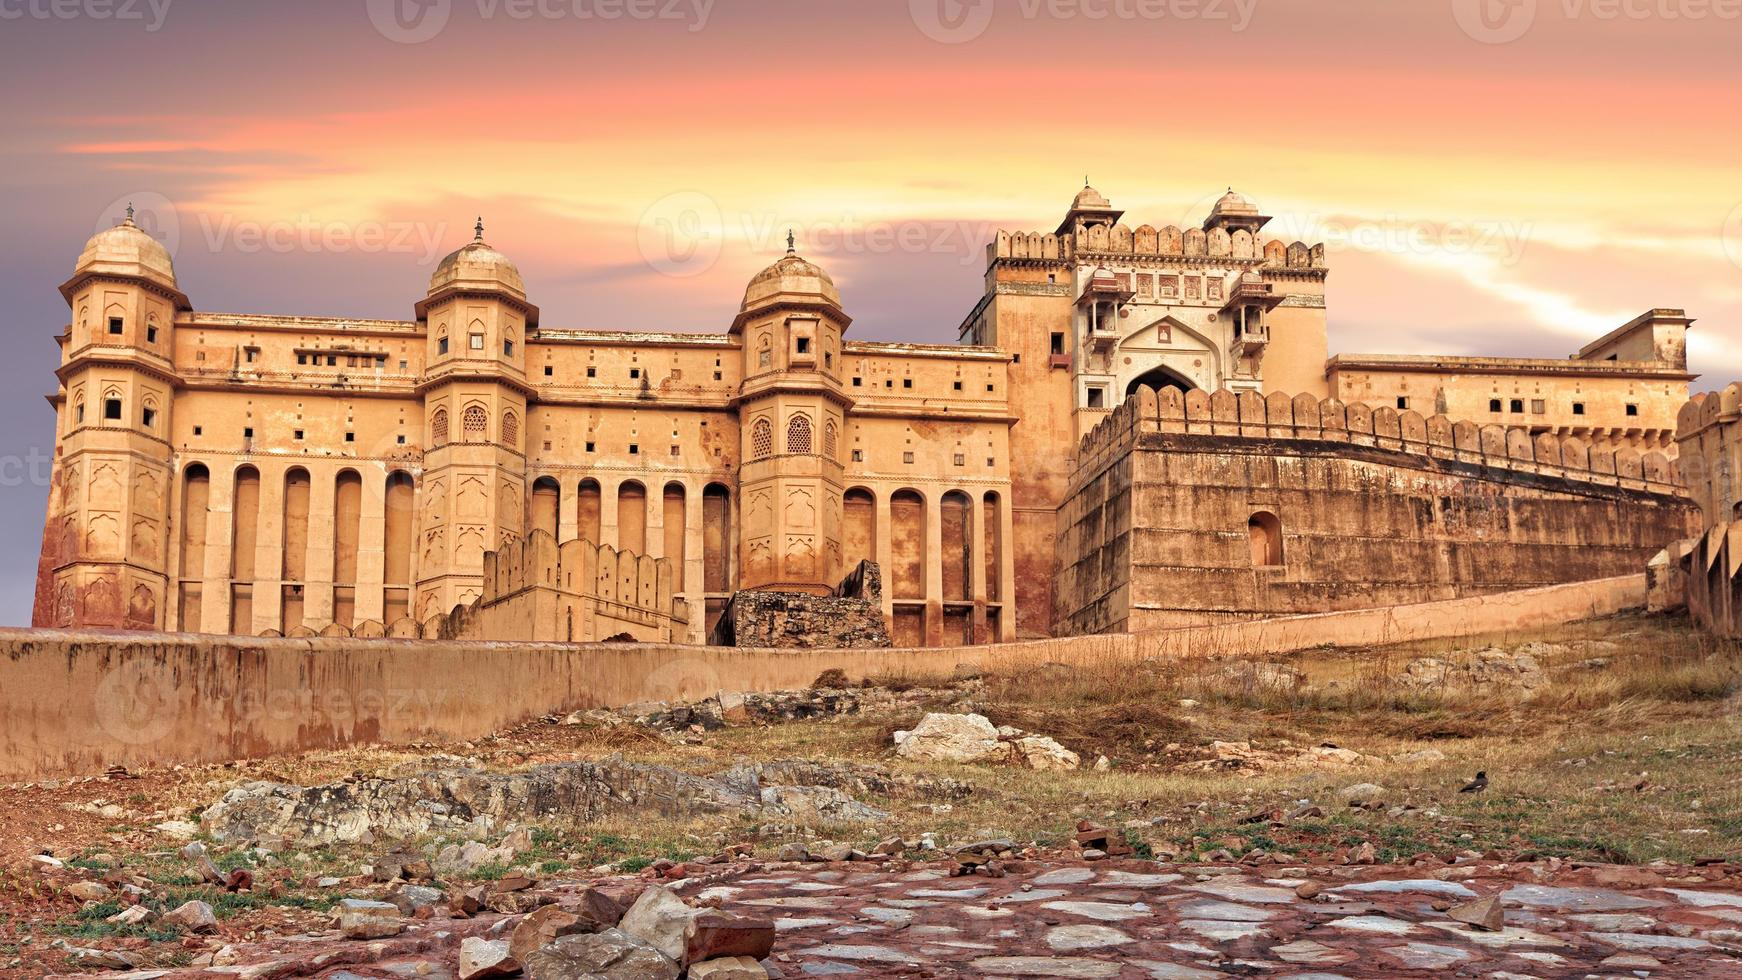 vista del forte d'ambra, Jaipur, India foto